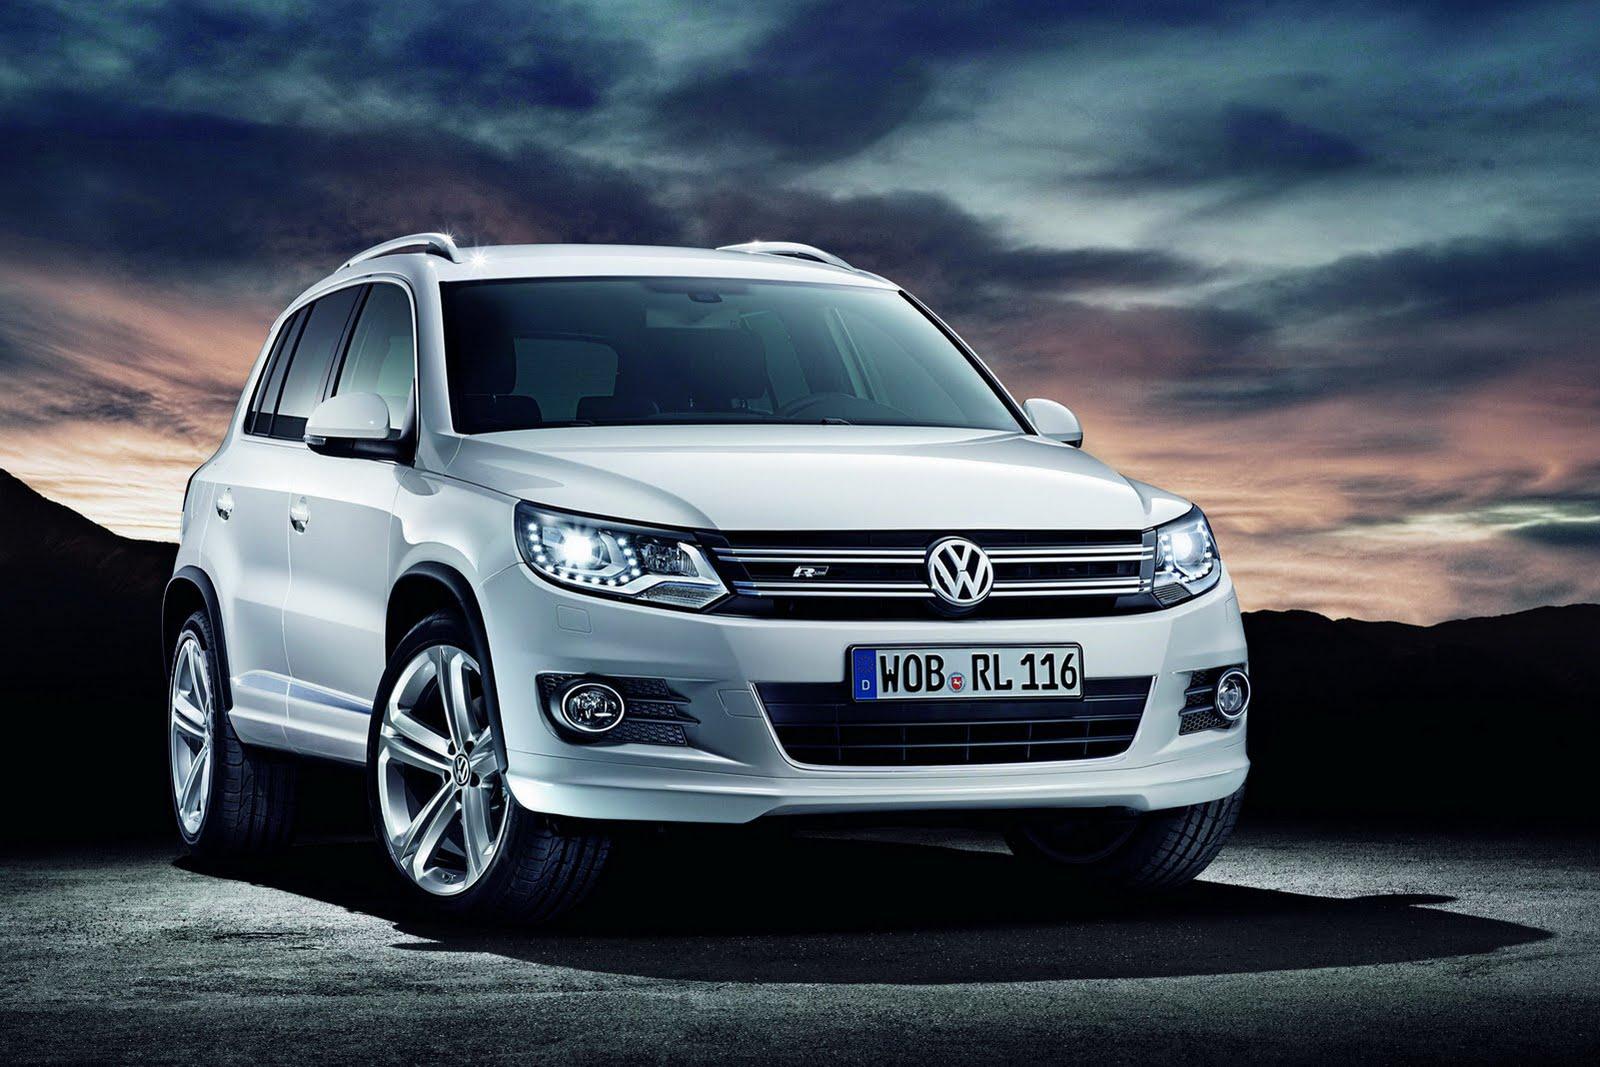 2012 Vw Tiguan R Line Packages Revealed Autoevolution